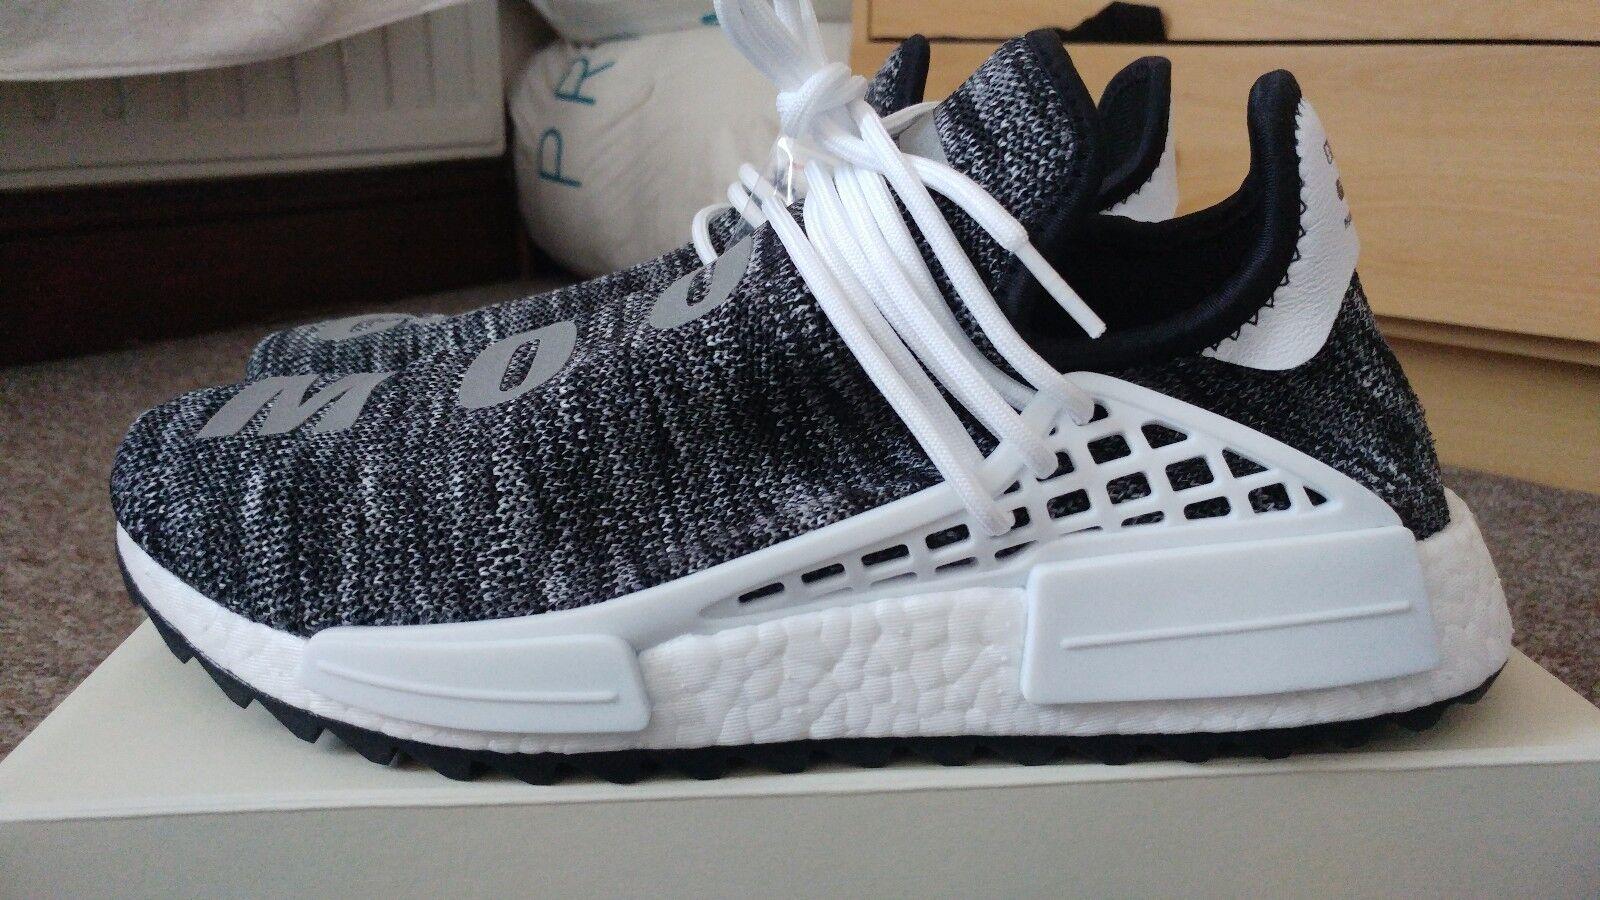 Adidas Human Race NMD's x Pharrell Willams